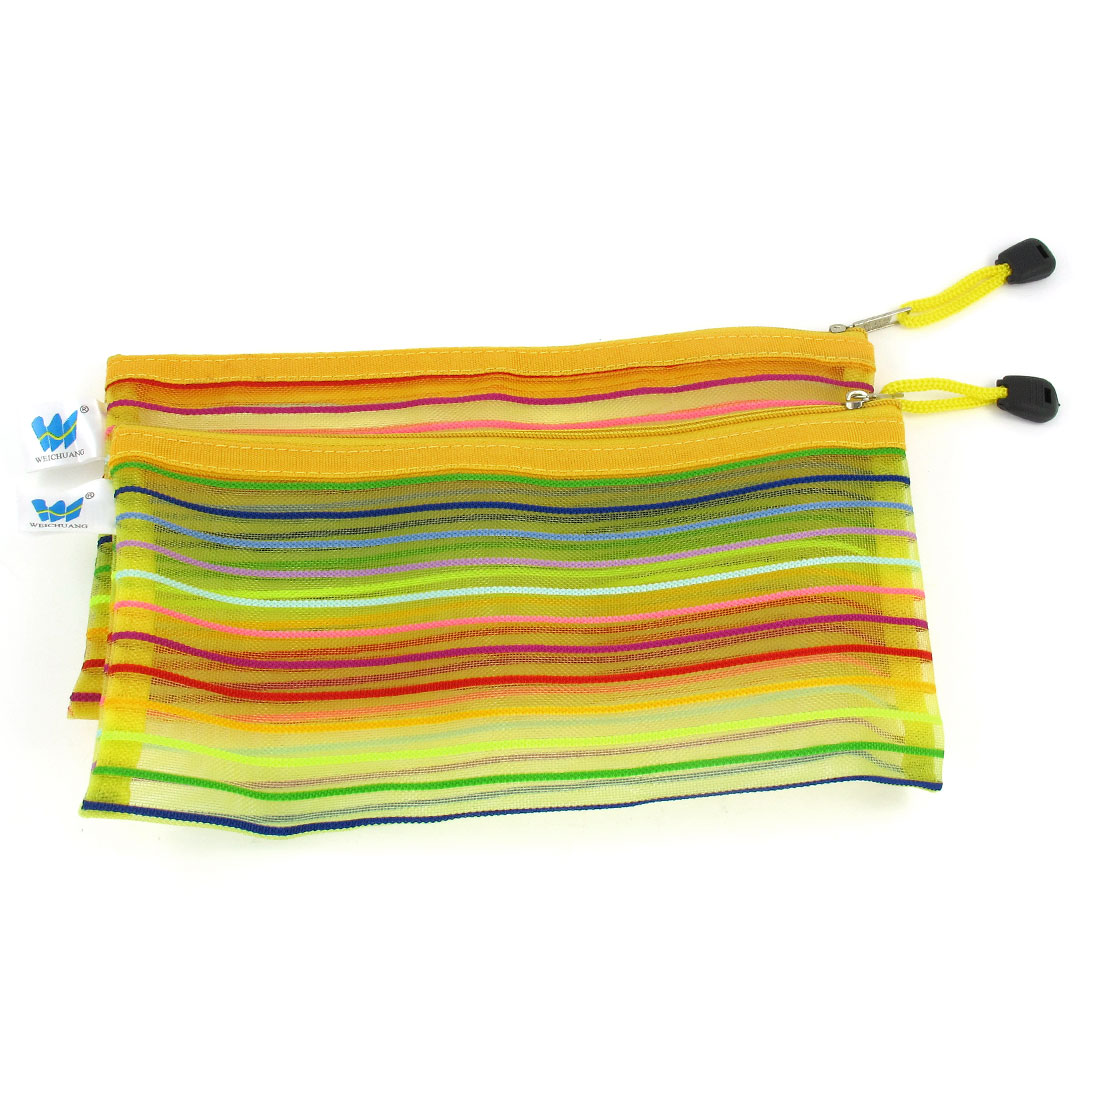 Dark Yellow Meshy Design Zip Closure Nylon File Bag Holder 2 Pcs